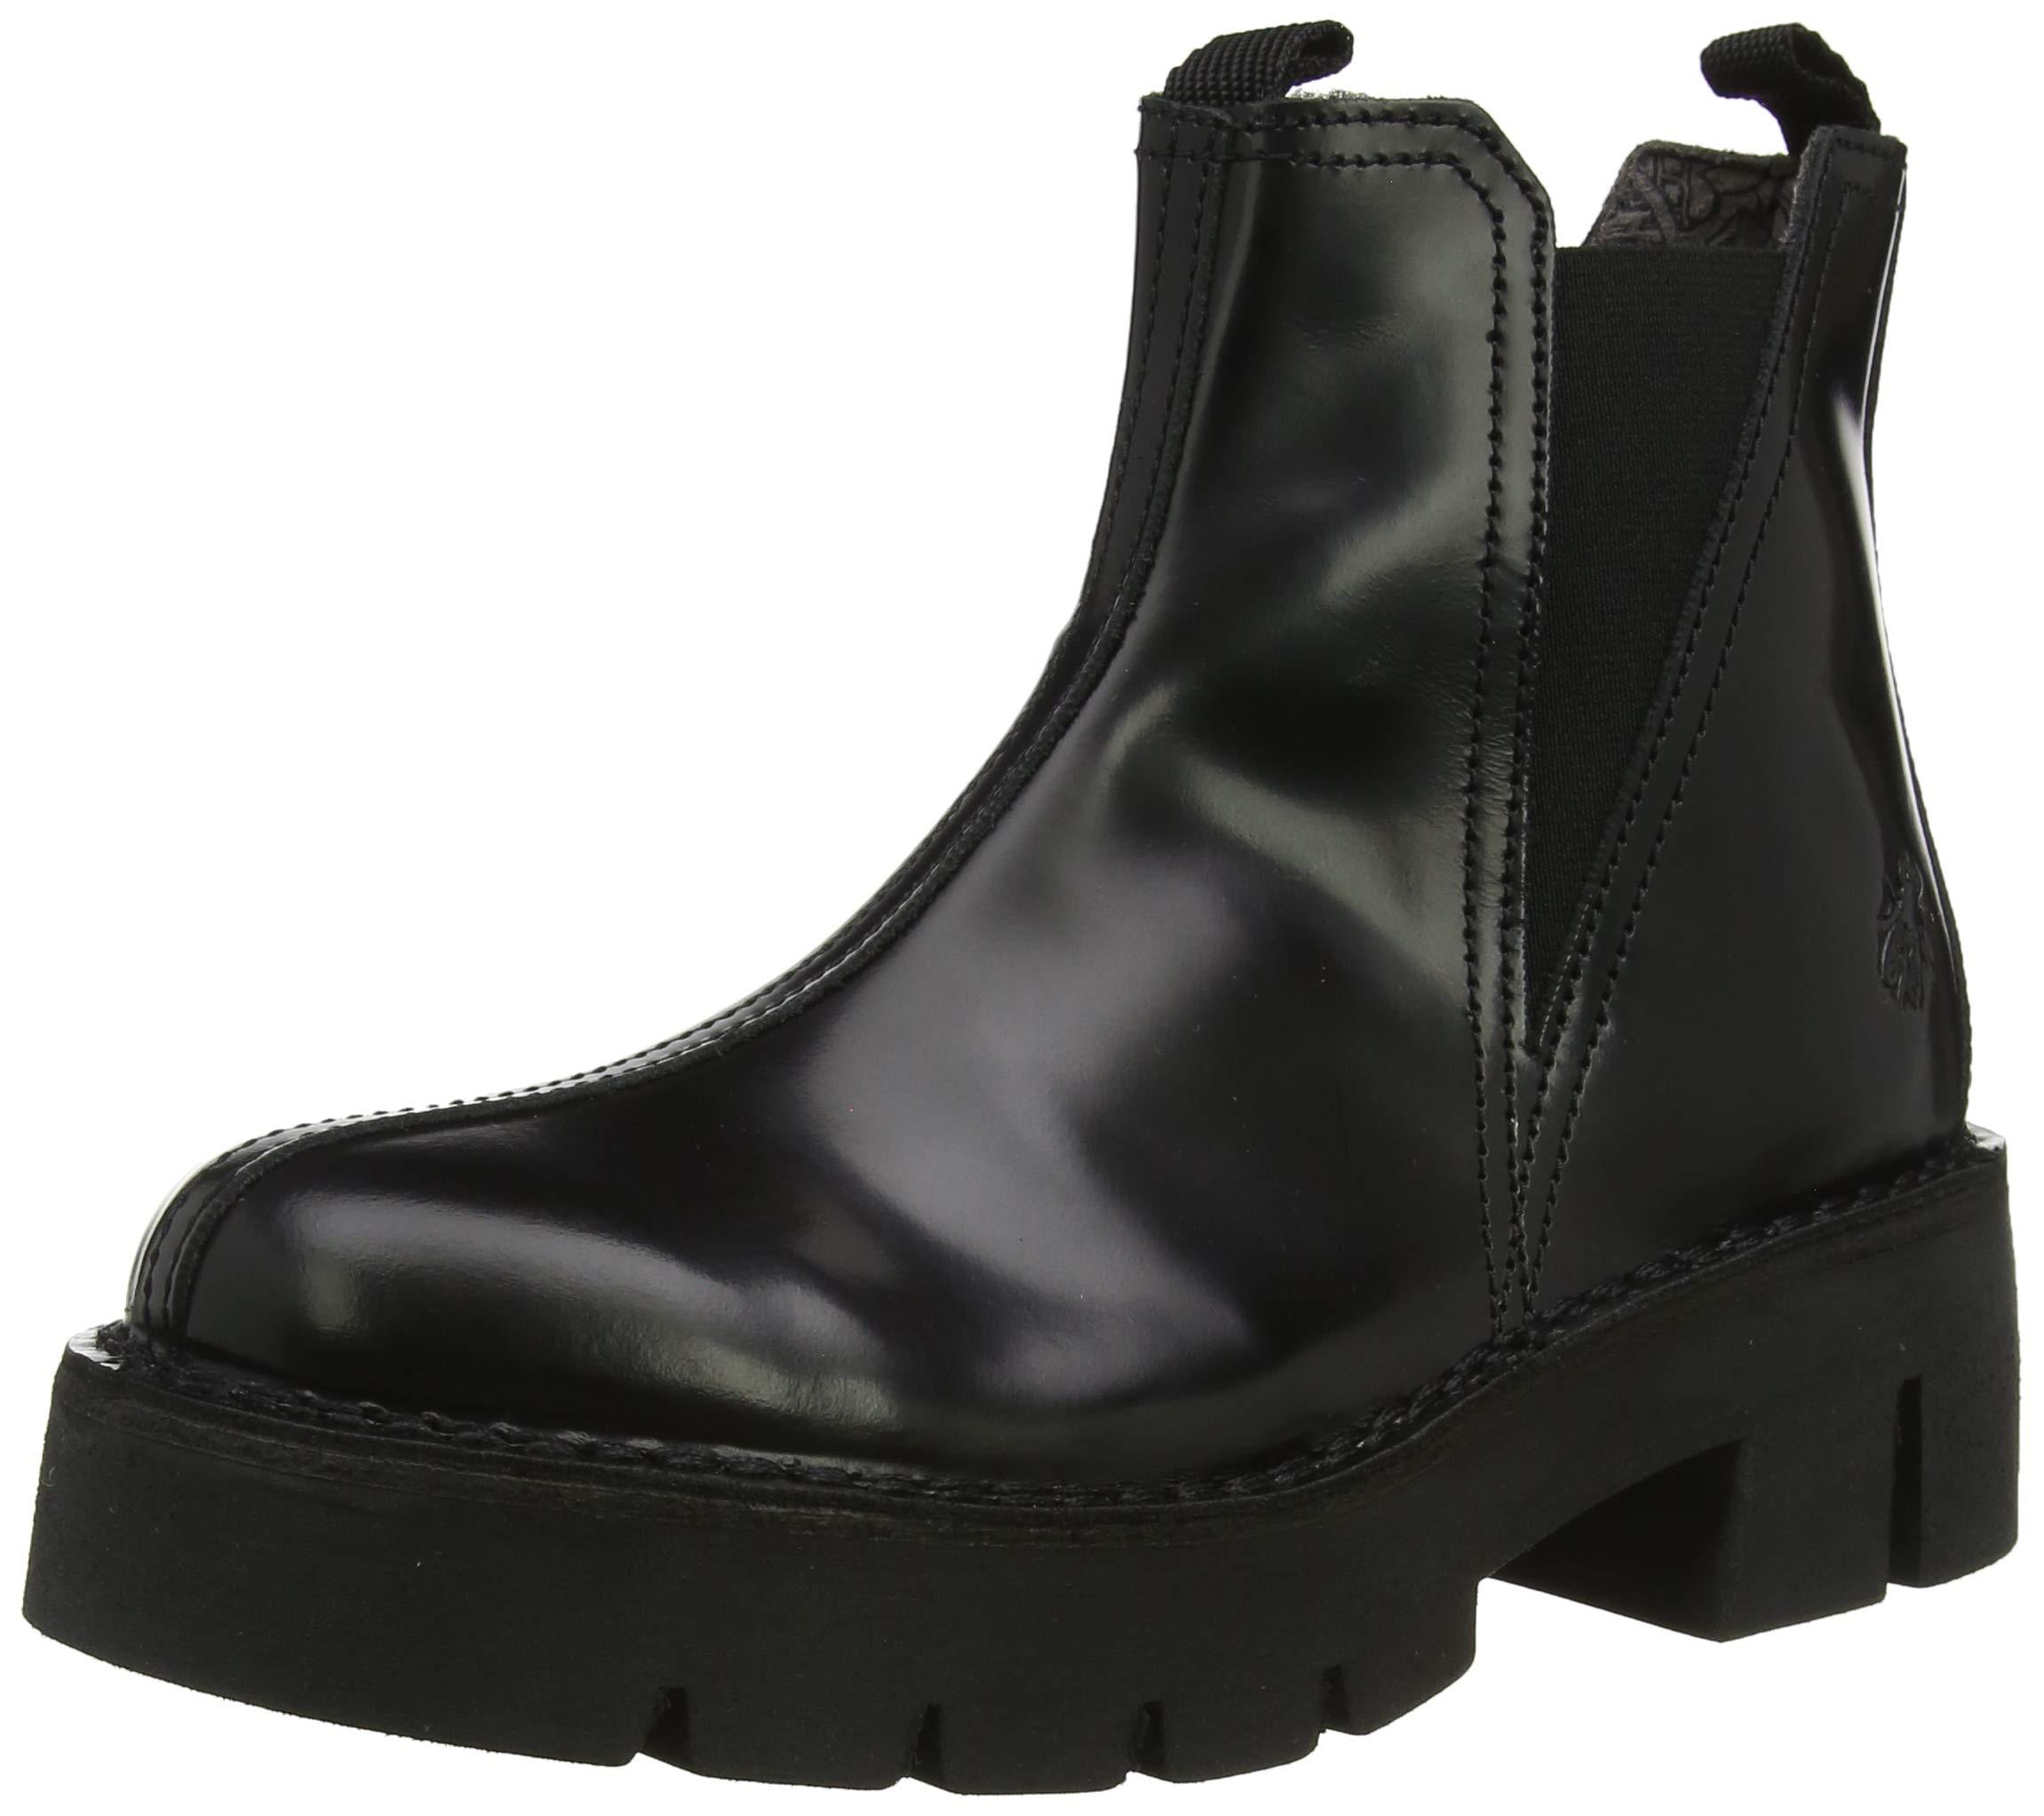 FemmeNoirblack Boots Fly Baco008flyChelsea Eu 00041 London pUSVqMz